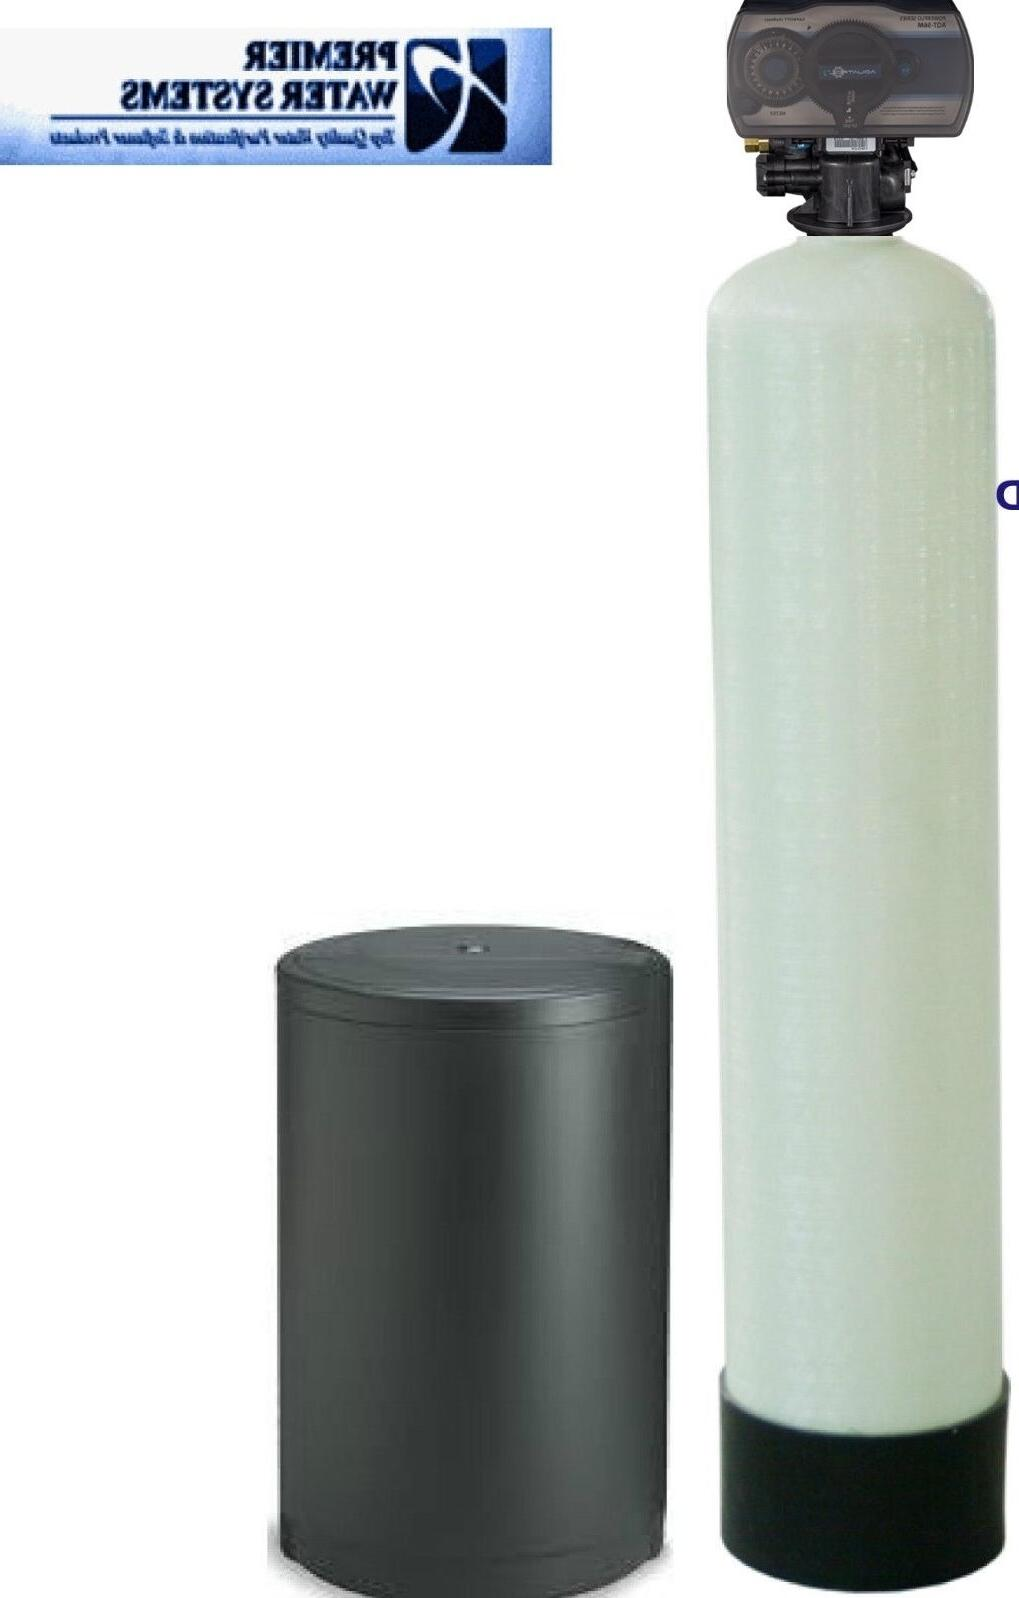 Premier Whole House Water Softener Meter Valve 64000 Grain.1